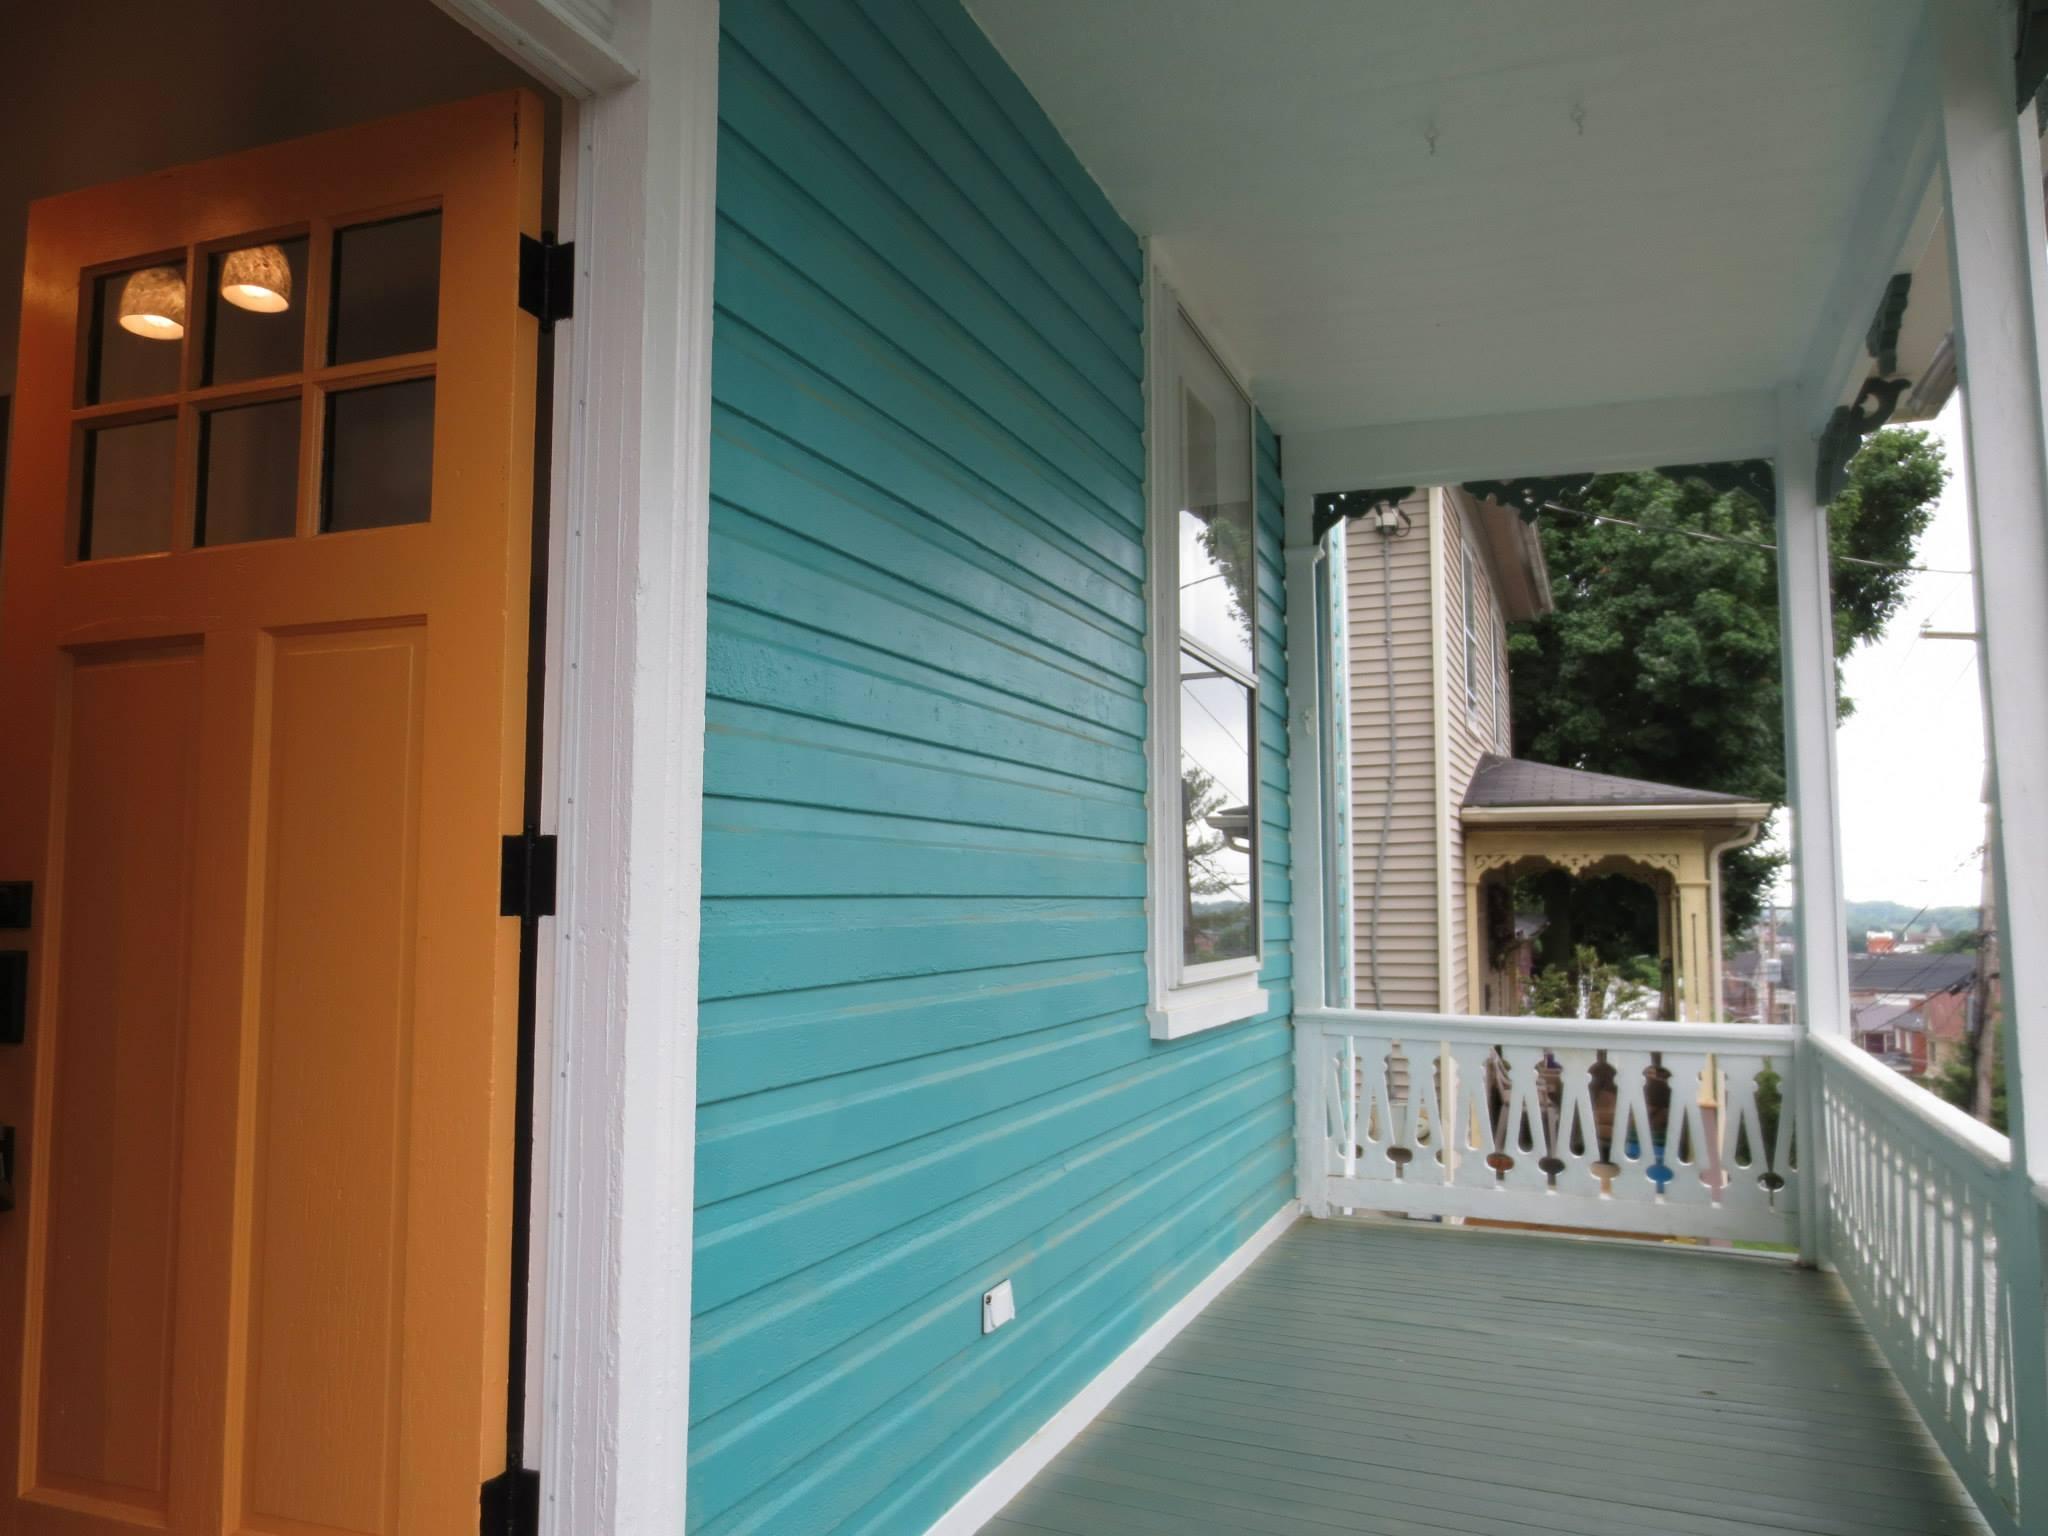 619 frederick st after renovation - front porch